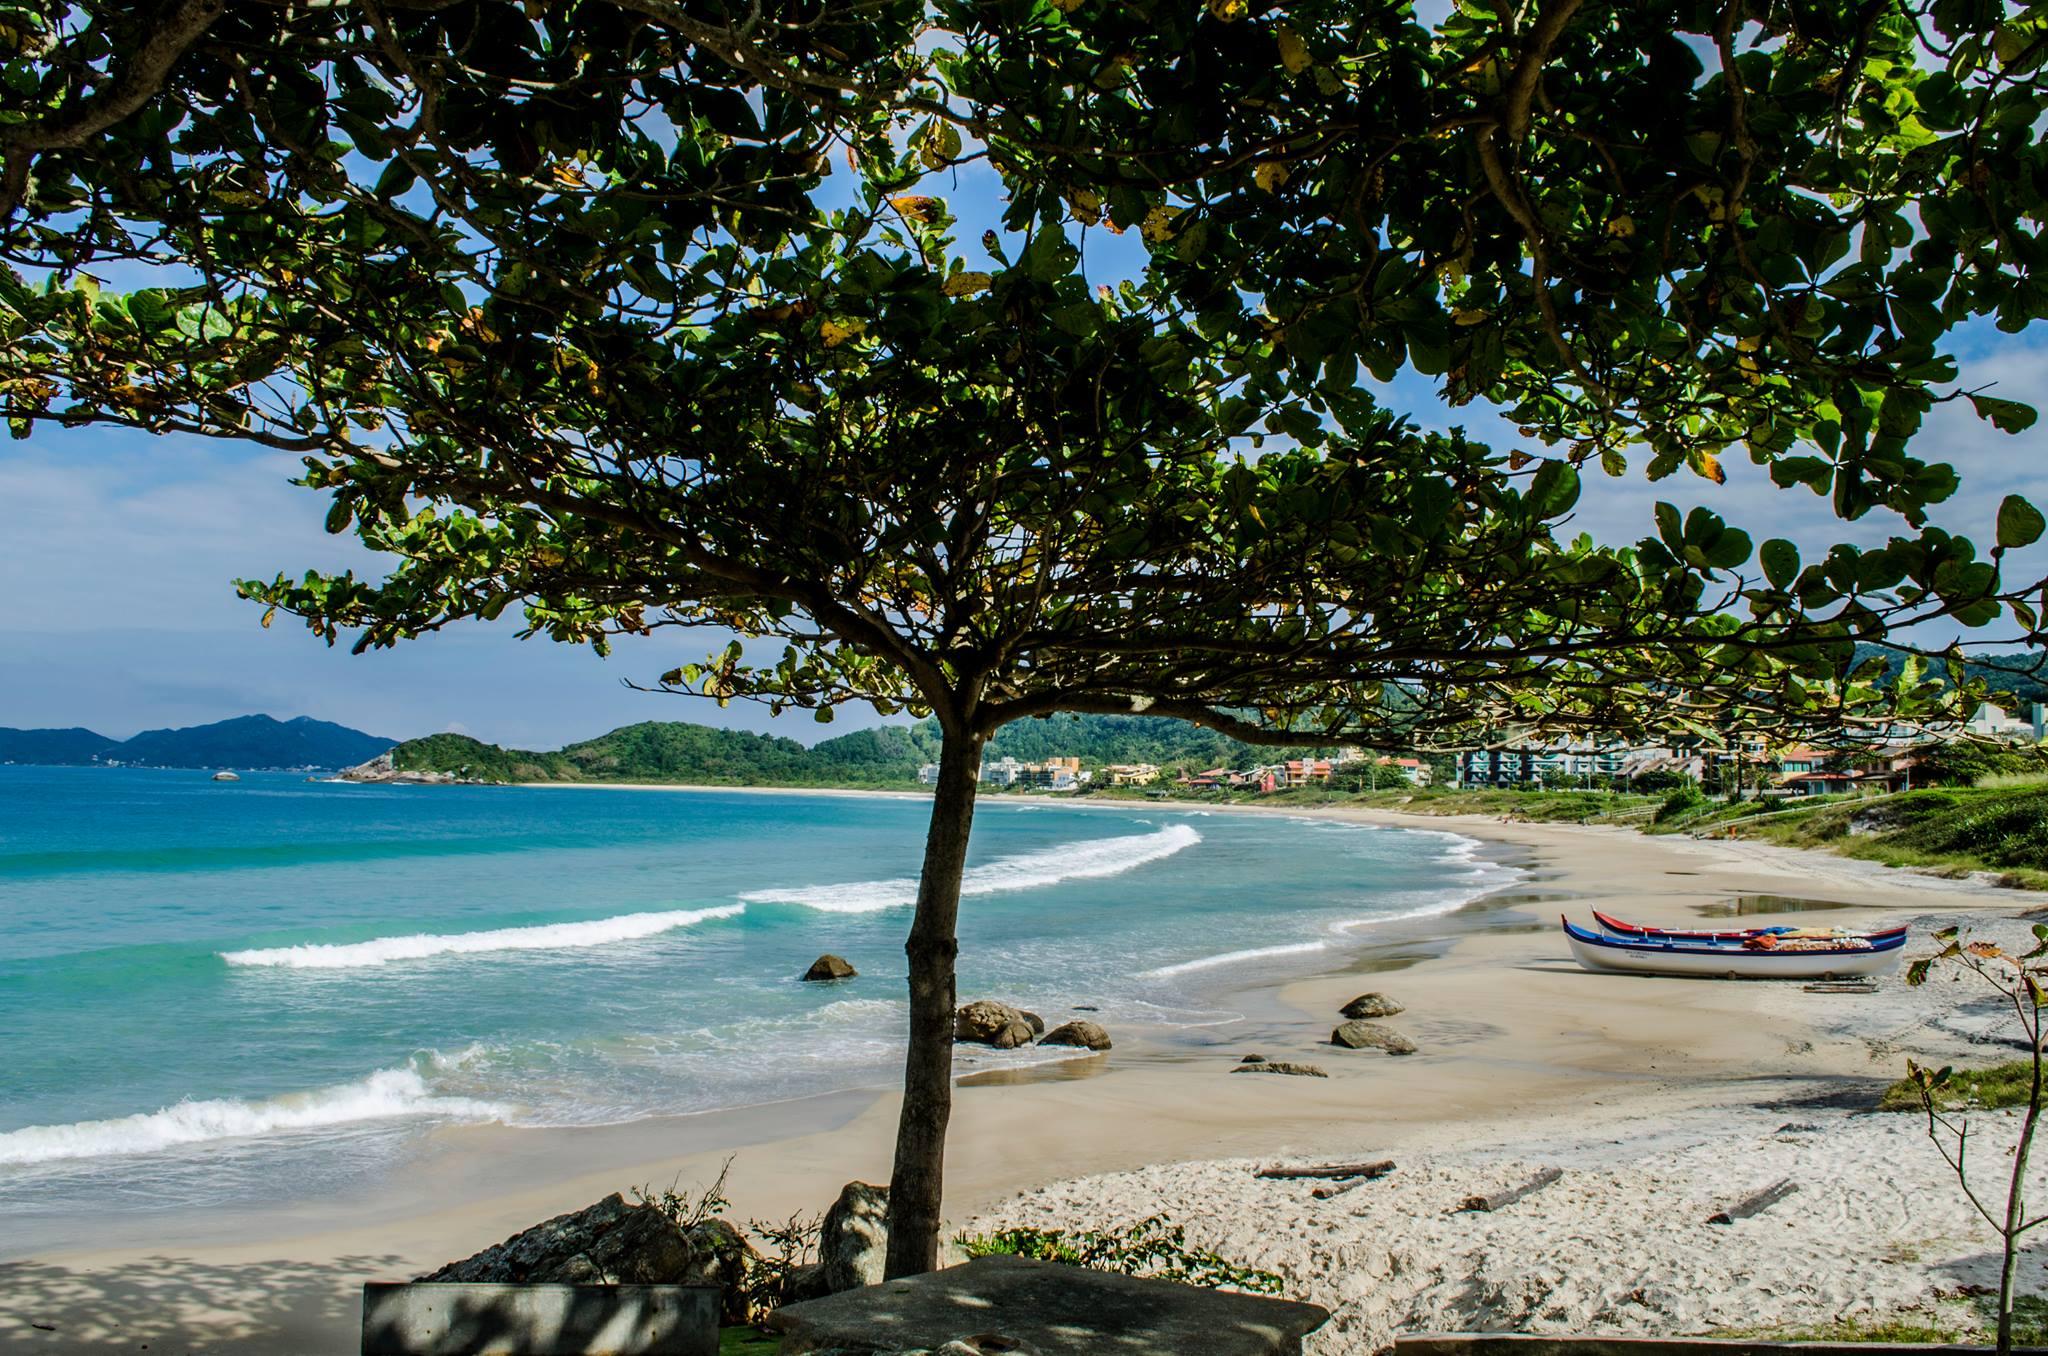 Praia de 4 Ilhas